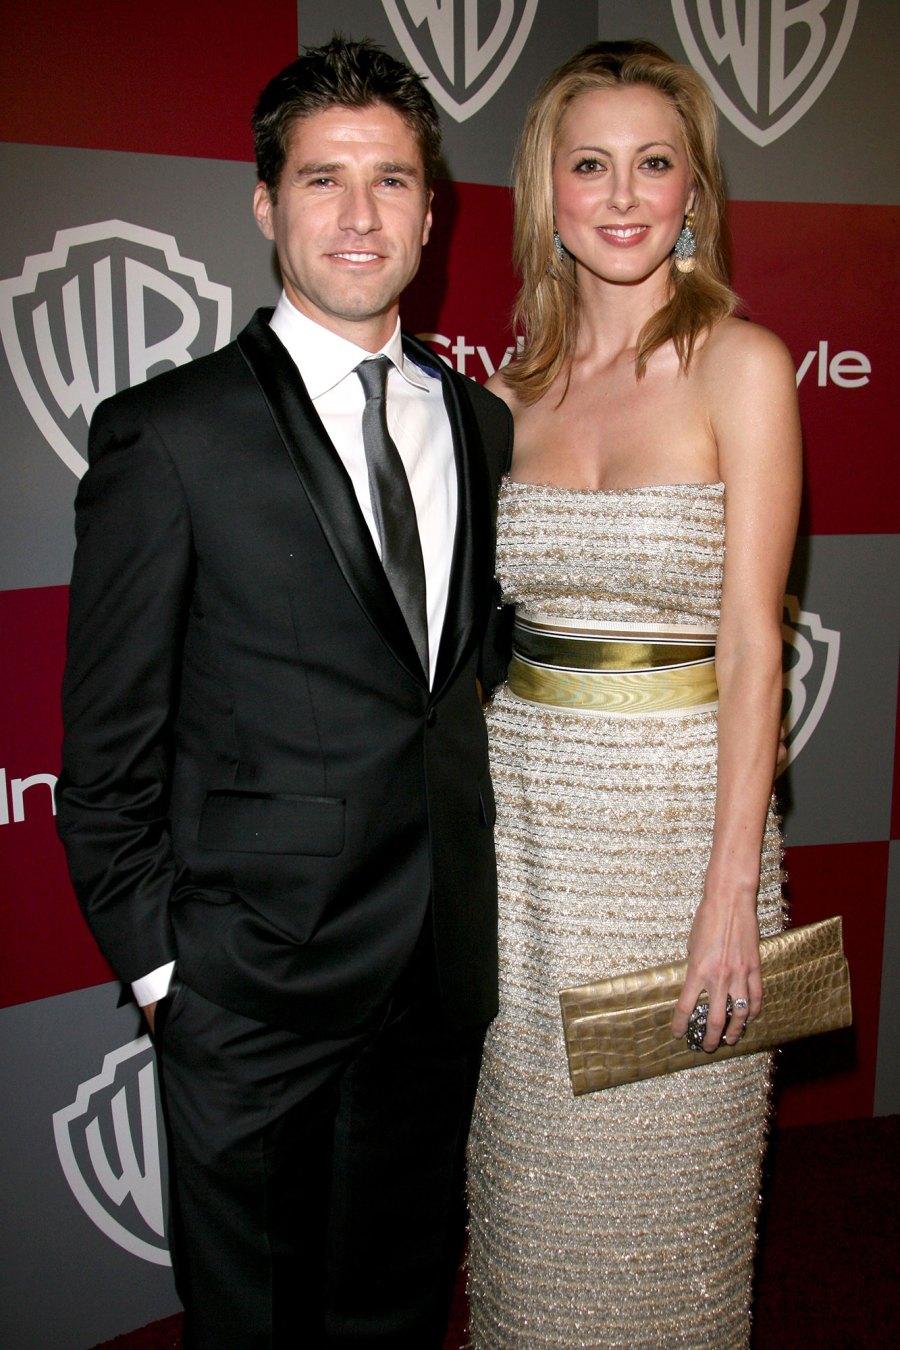 2011 Eva Amurri and Kyle Martino Relationship